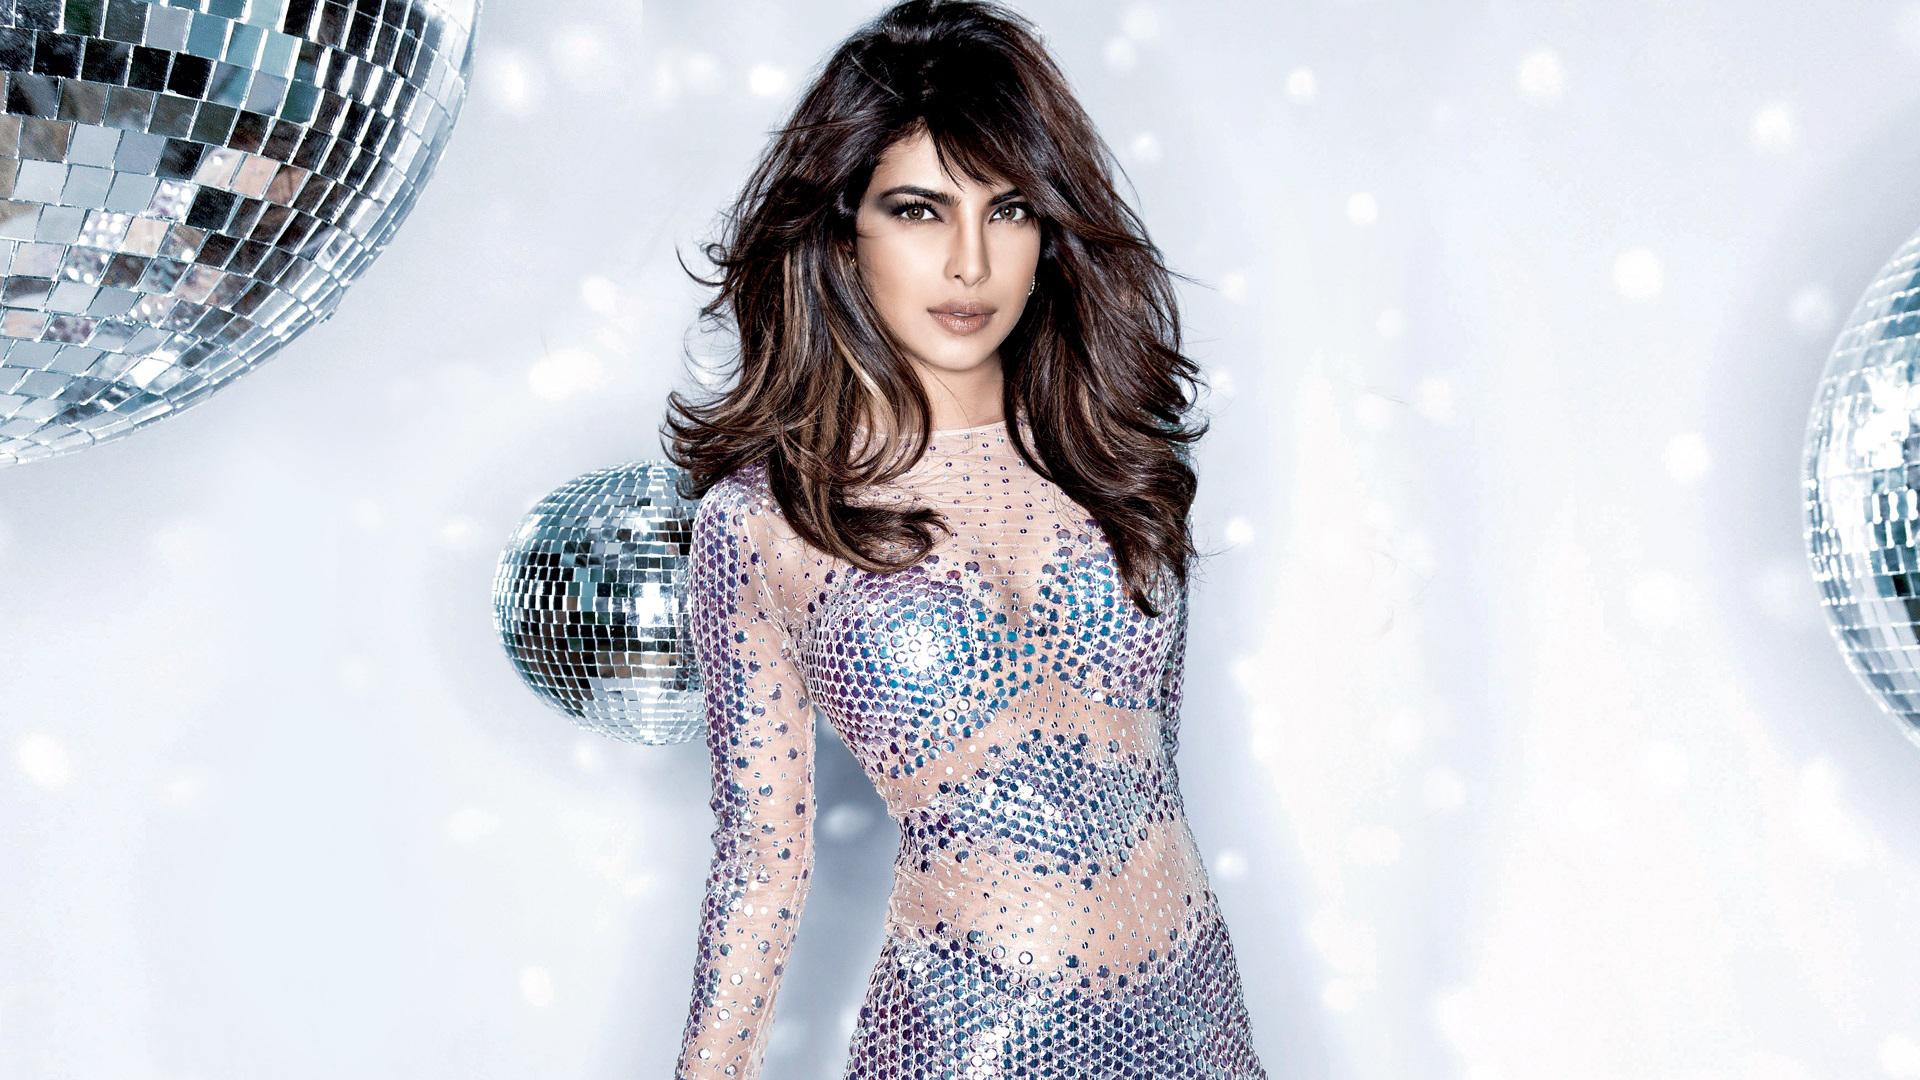 Priyanka Chopra Full Hd Wallpaper And Background Image -9308